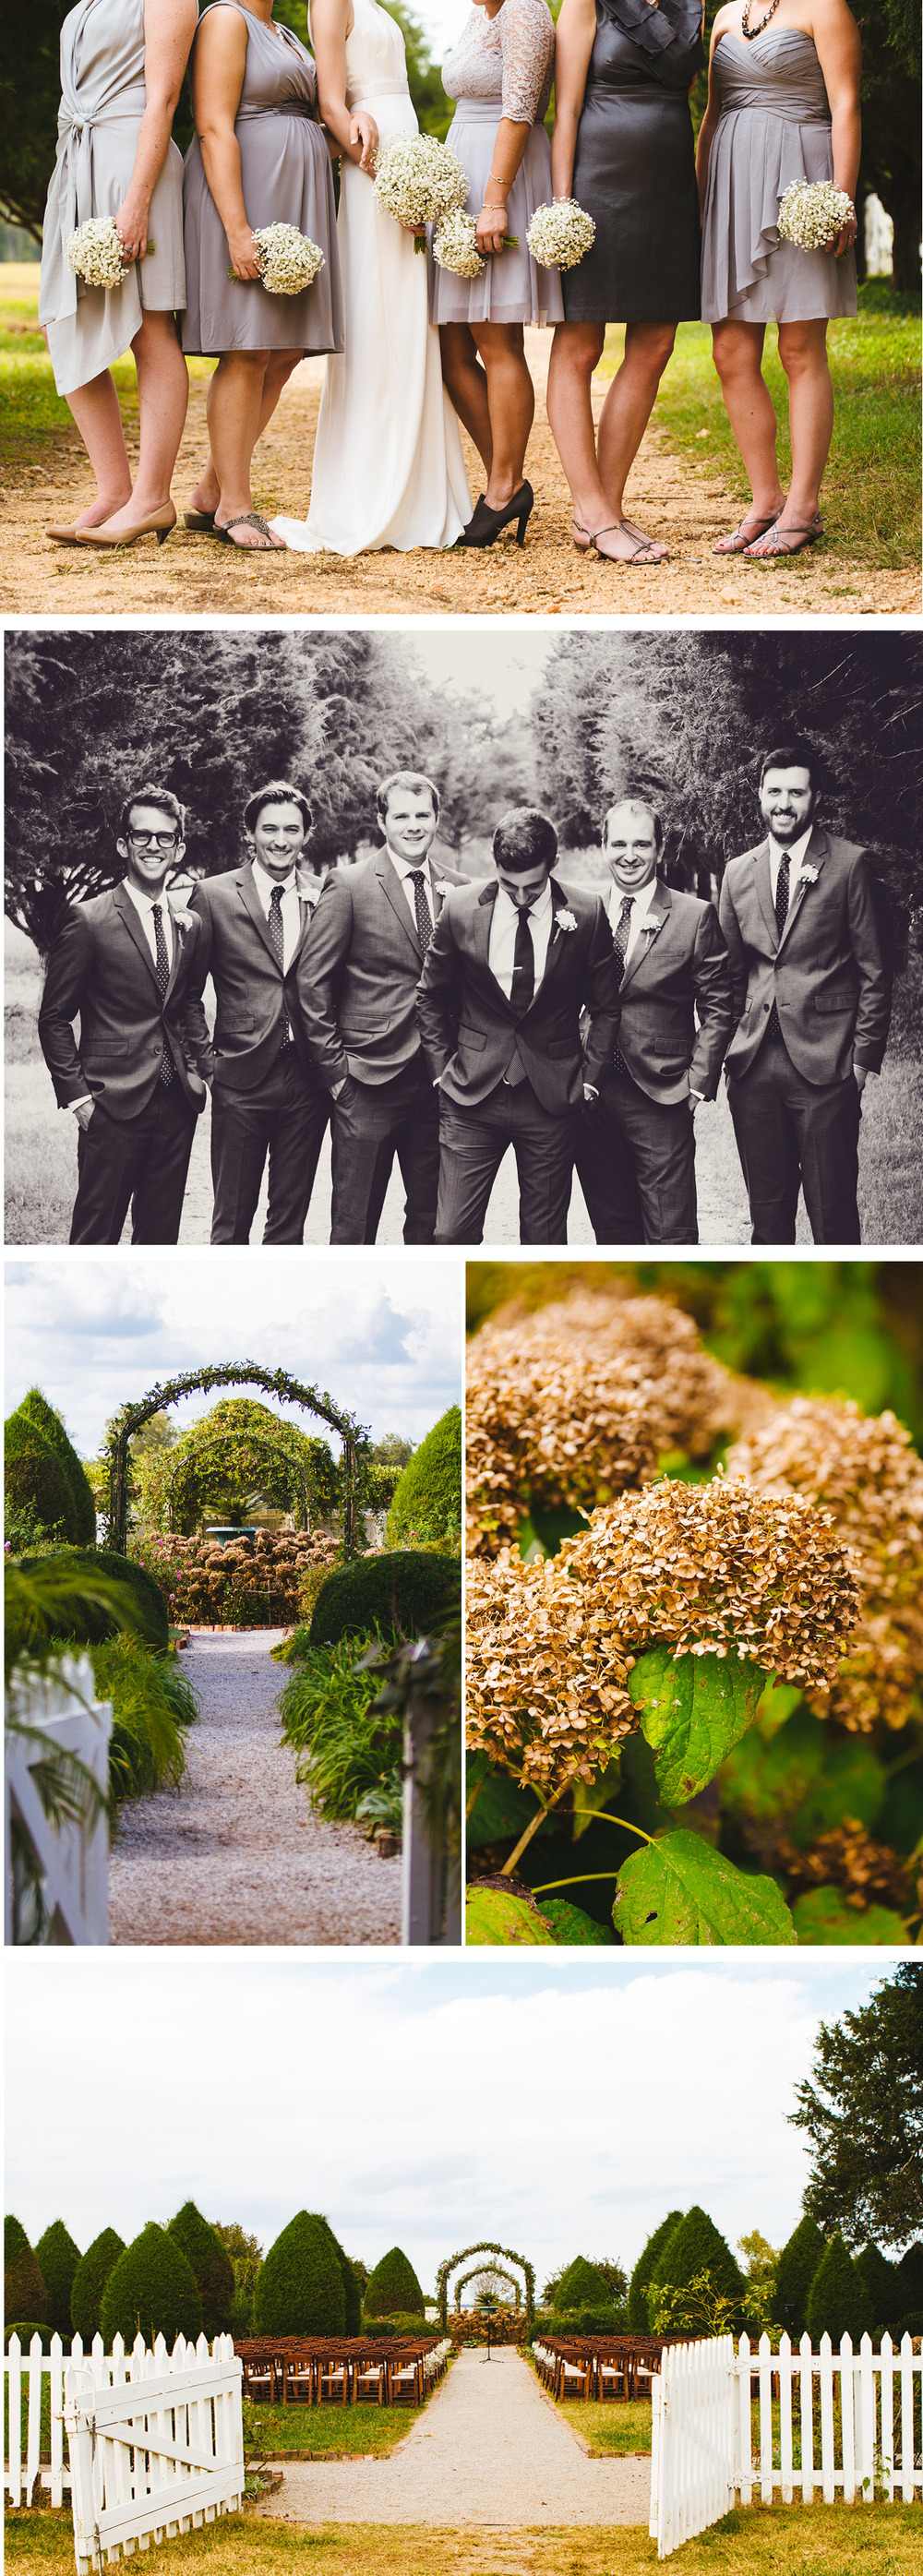 CK-Photo-Nashville-Wedding-Photographer-TN9.jpg